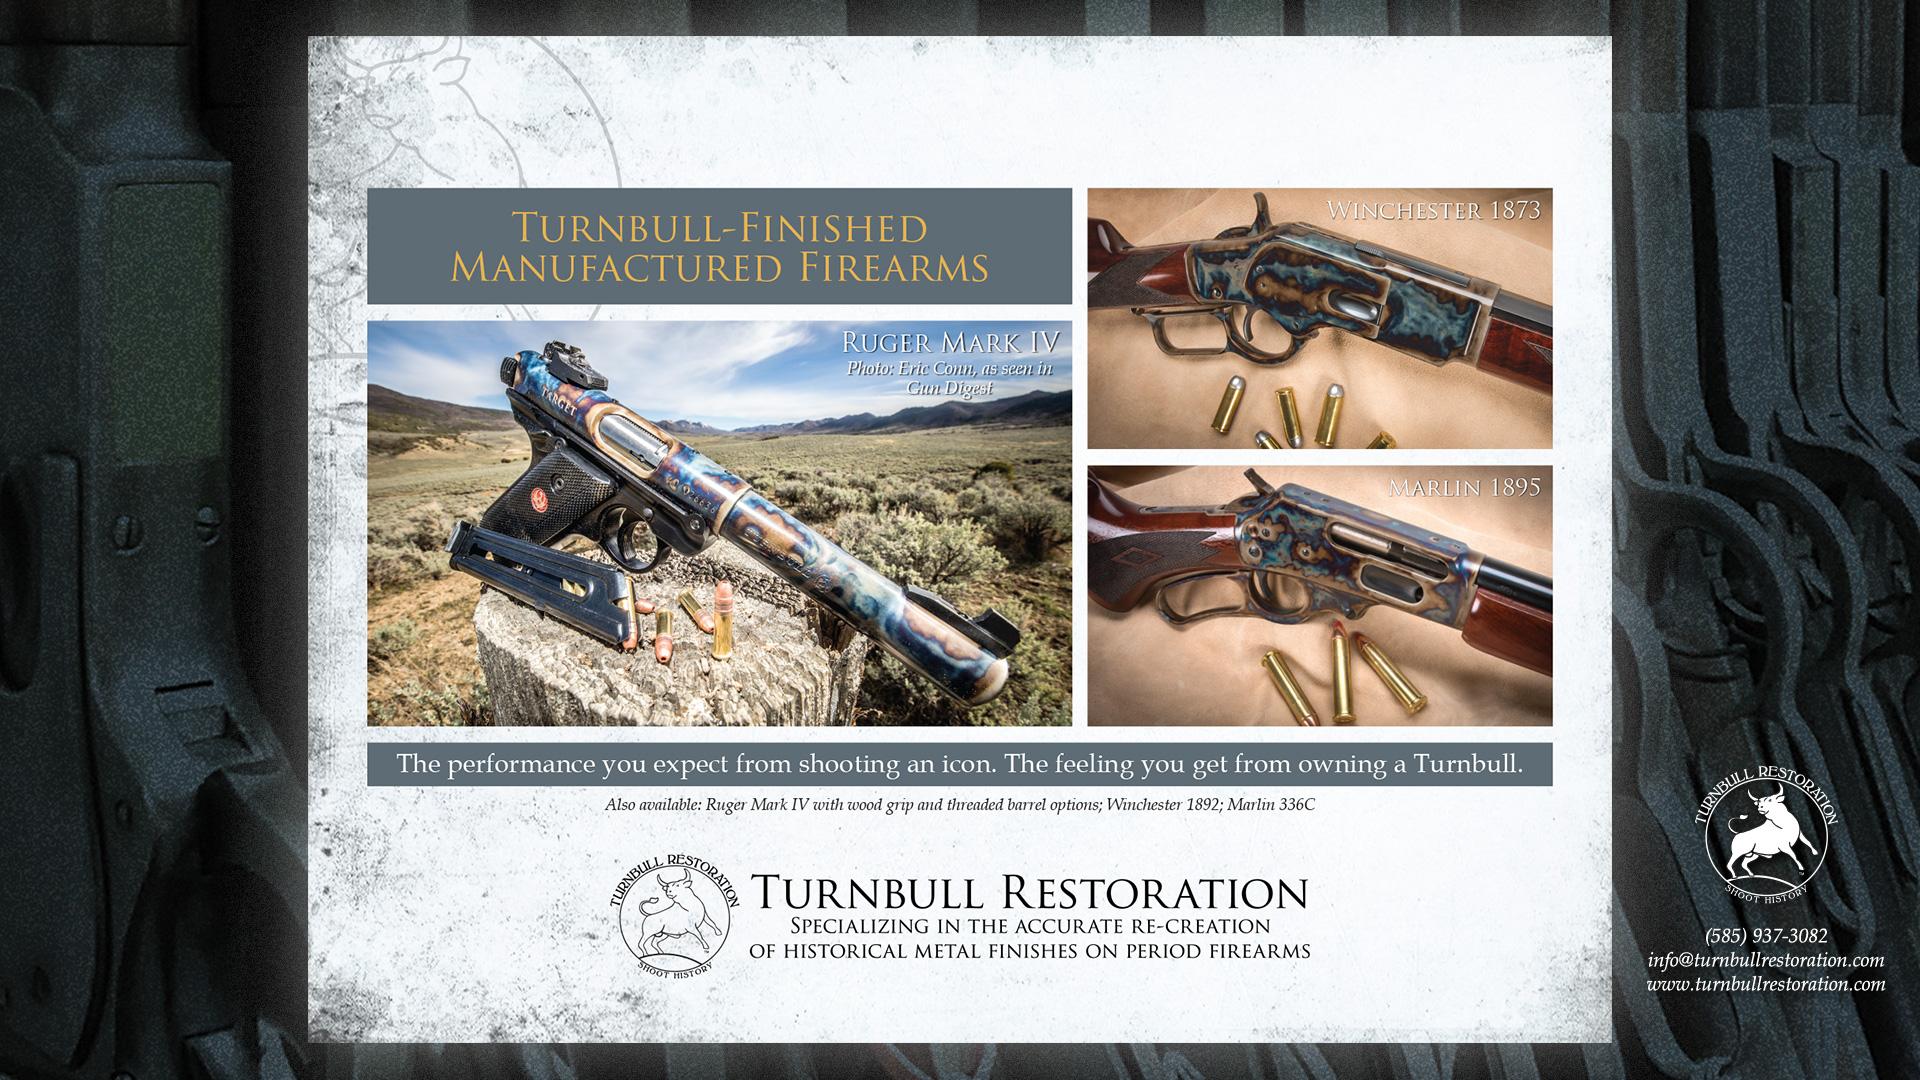 2018 Calendar Wallpapers and Credits - Turnbull Restoration